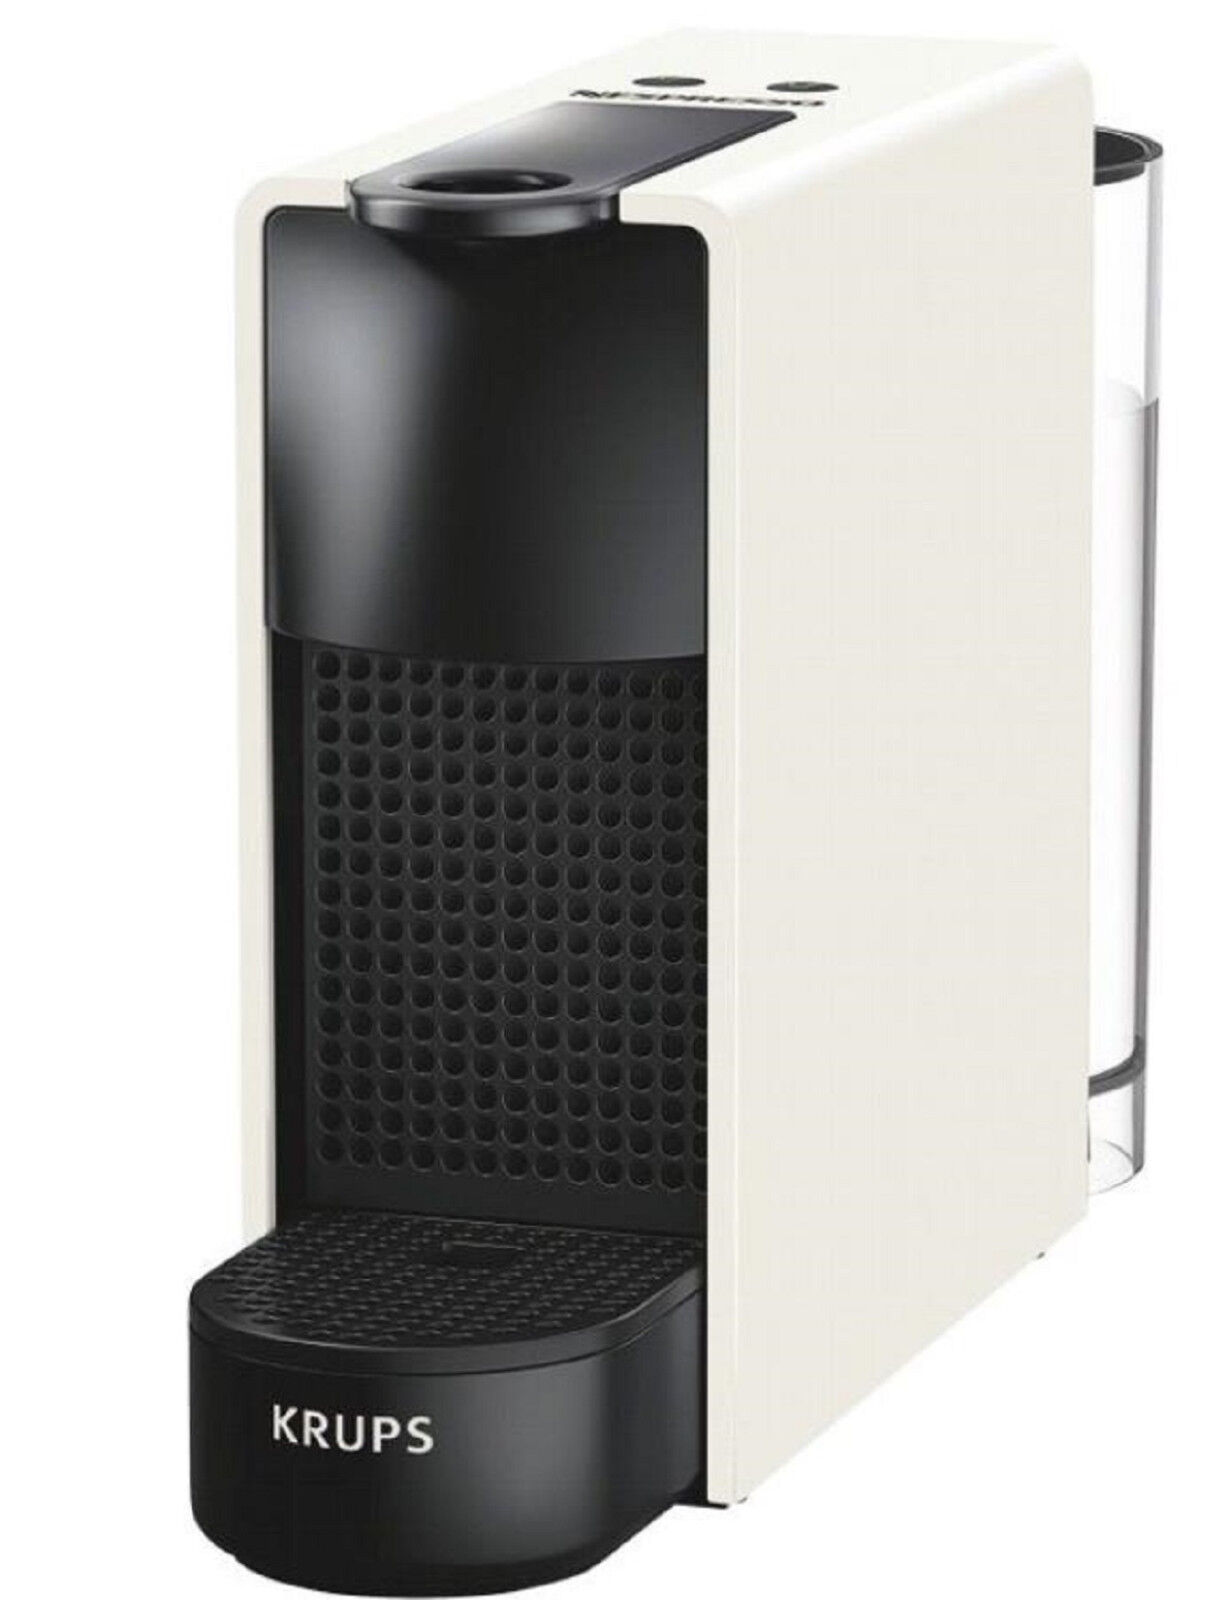 krups inissia nespresso maschine xn1005 kaffeemaschine. Black Bedroom Furniture Sets. Home Design Ideas